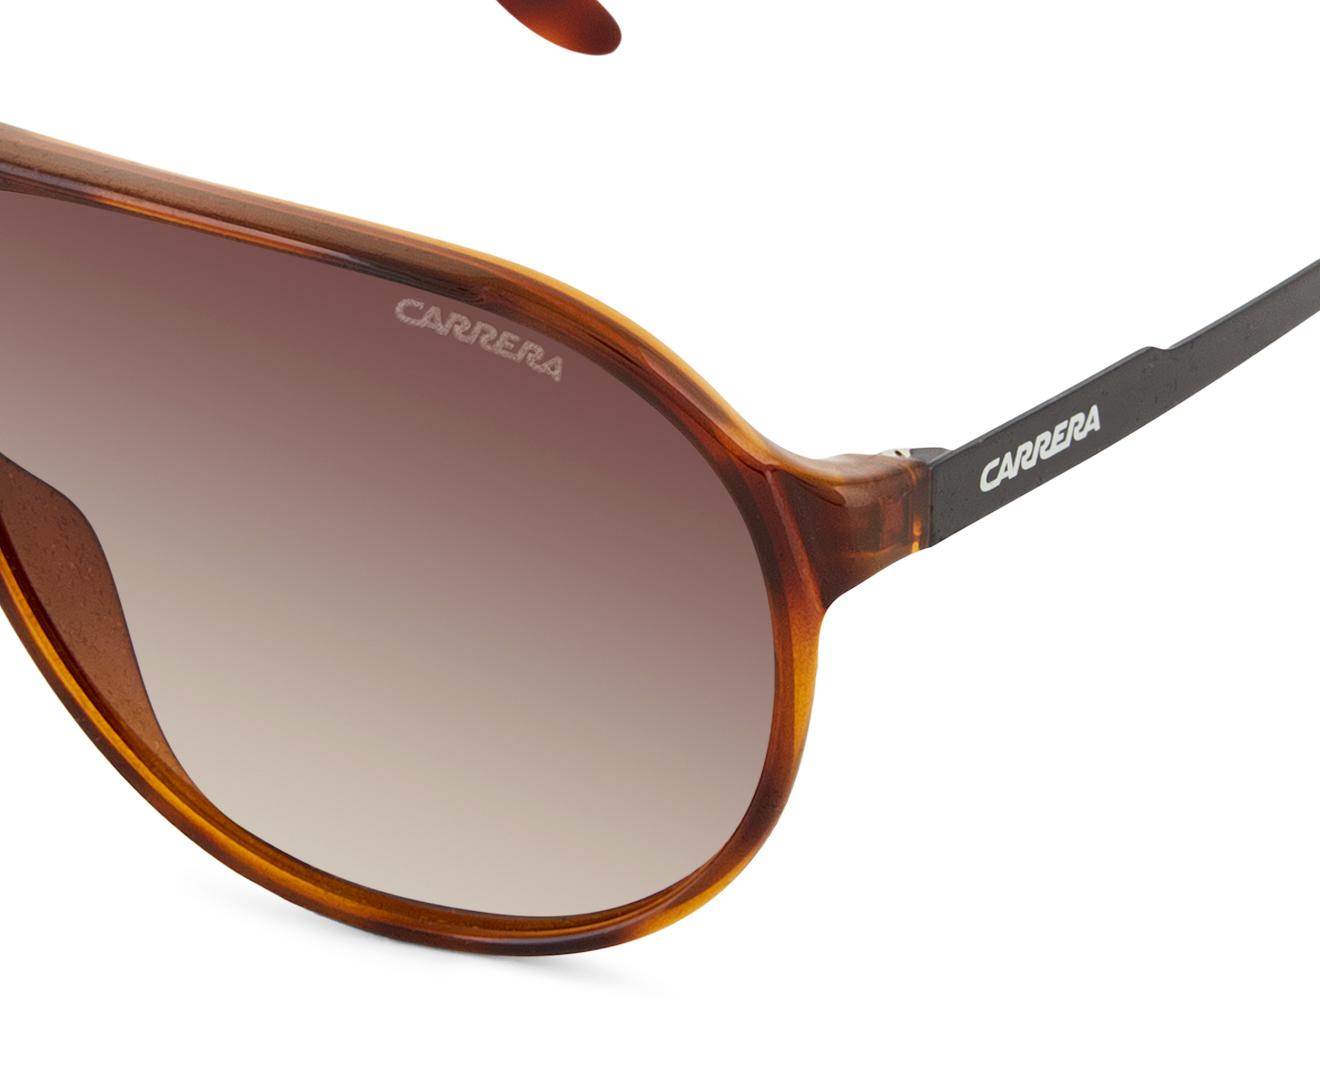 06eabe2e94d95 Carrera Men s New Champion Sunglasses - Havana